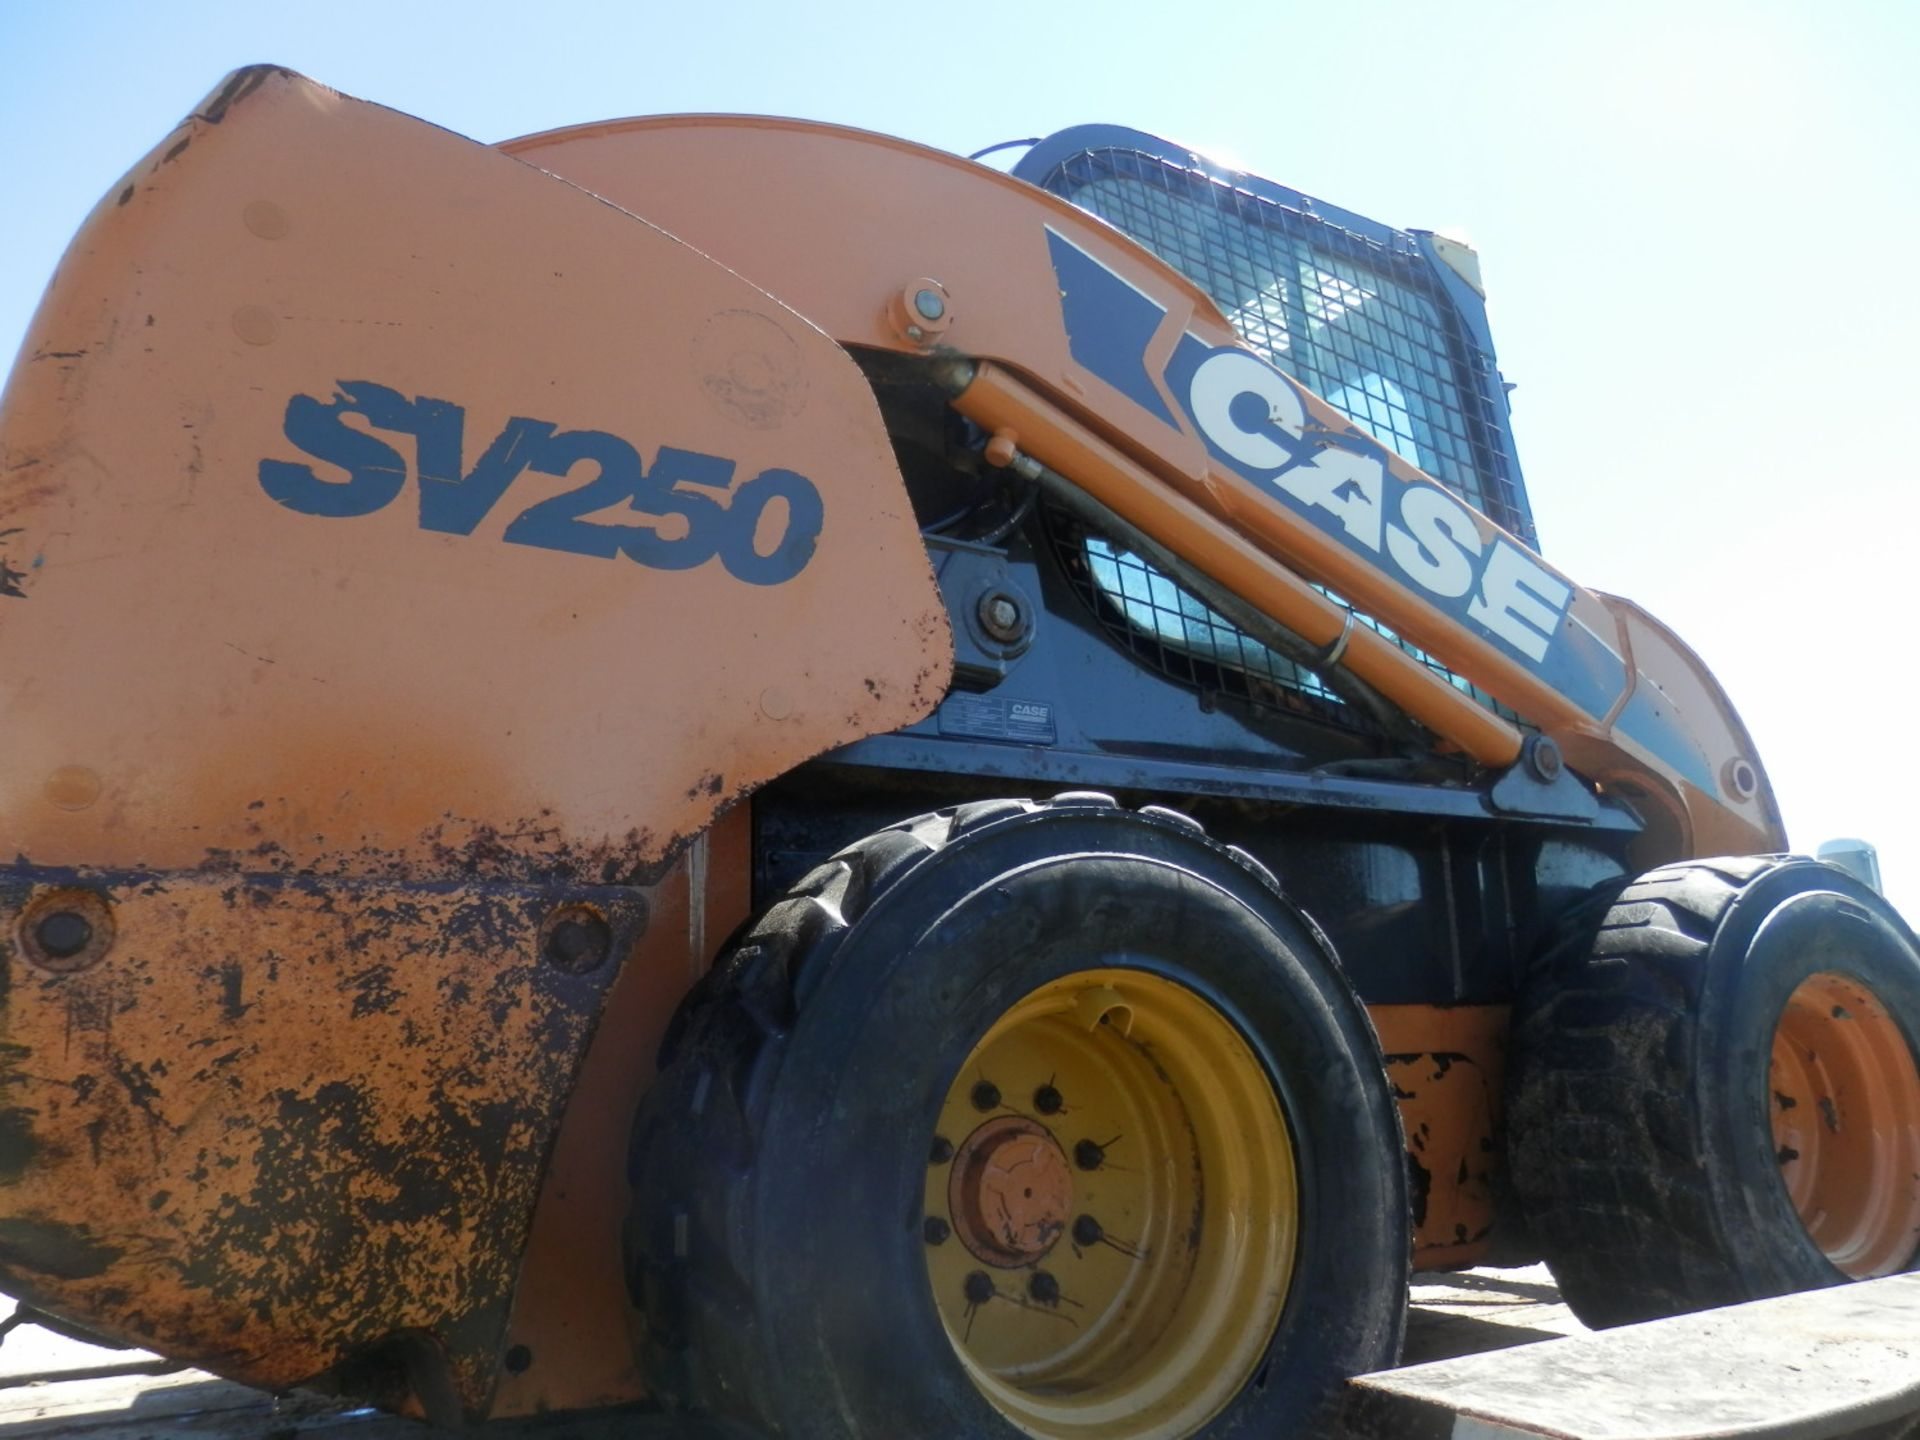 Lot 13 - CASE SV250 SKID STEER-PROJECT (Needs motor)